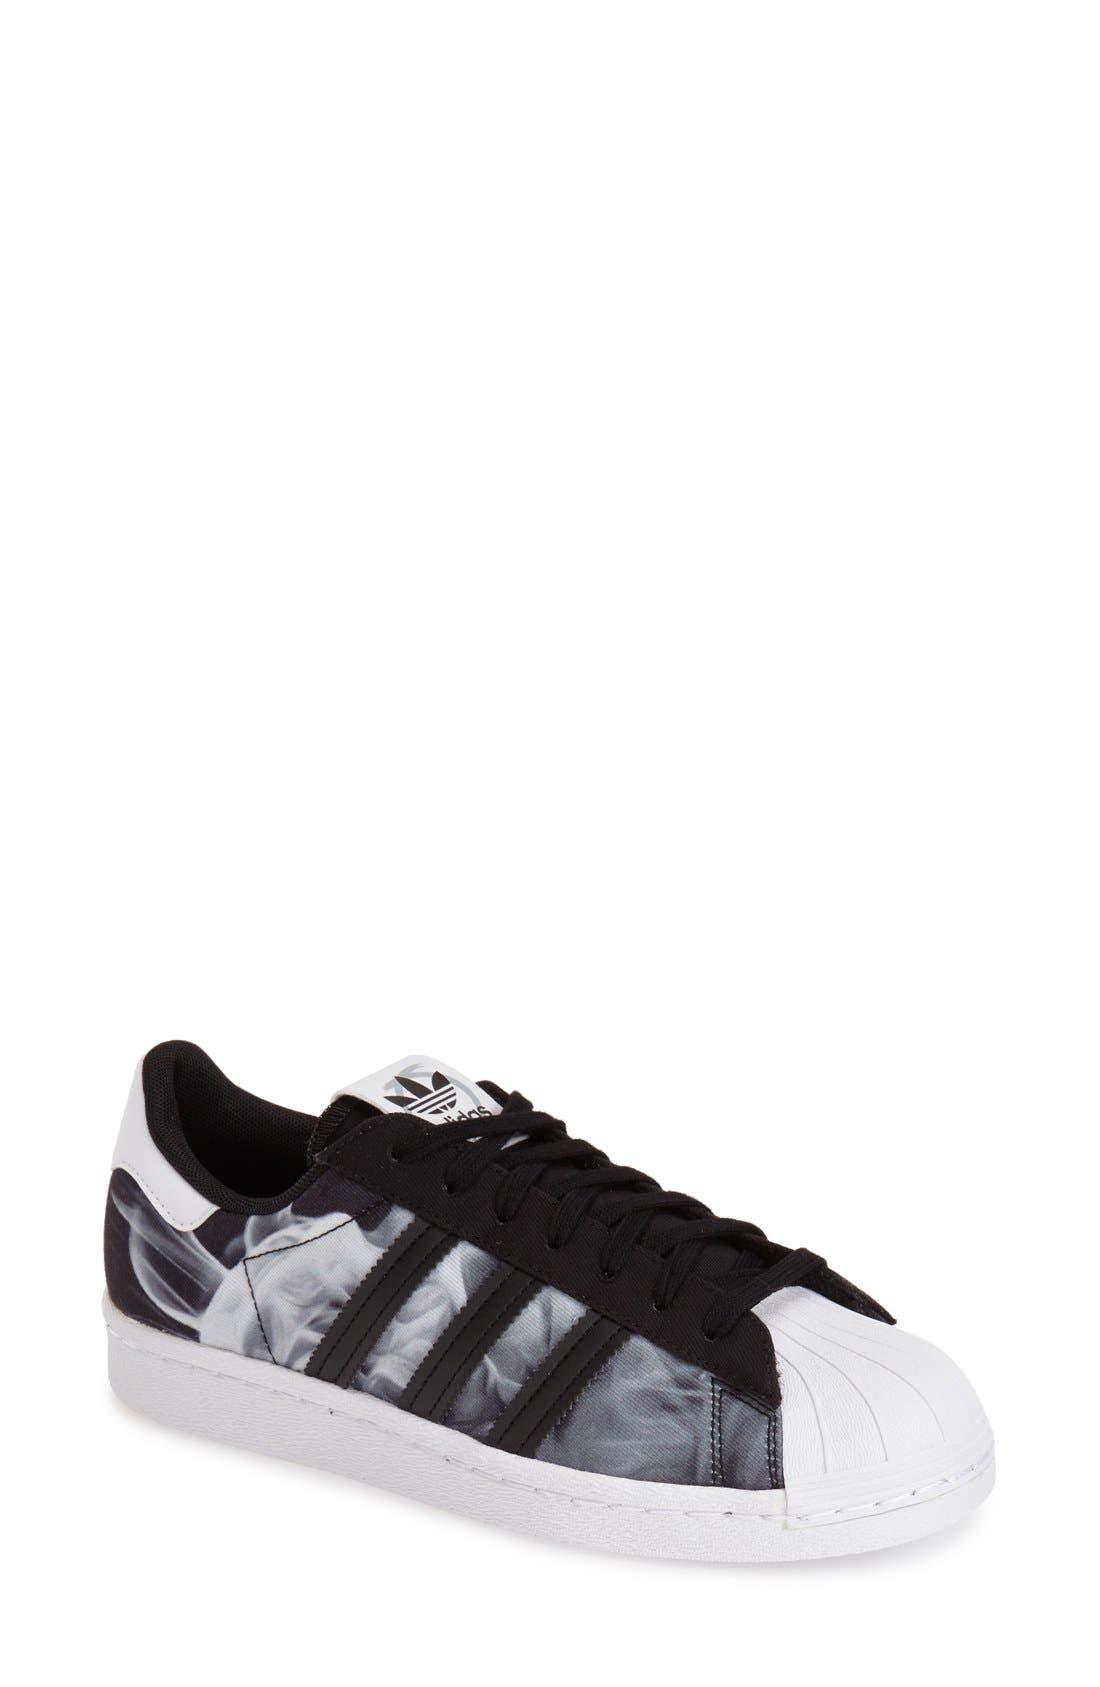 Alternate Image 1 Selected - adidas 'Superstar 80 - Rita Ora' Sneaker (Women)